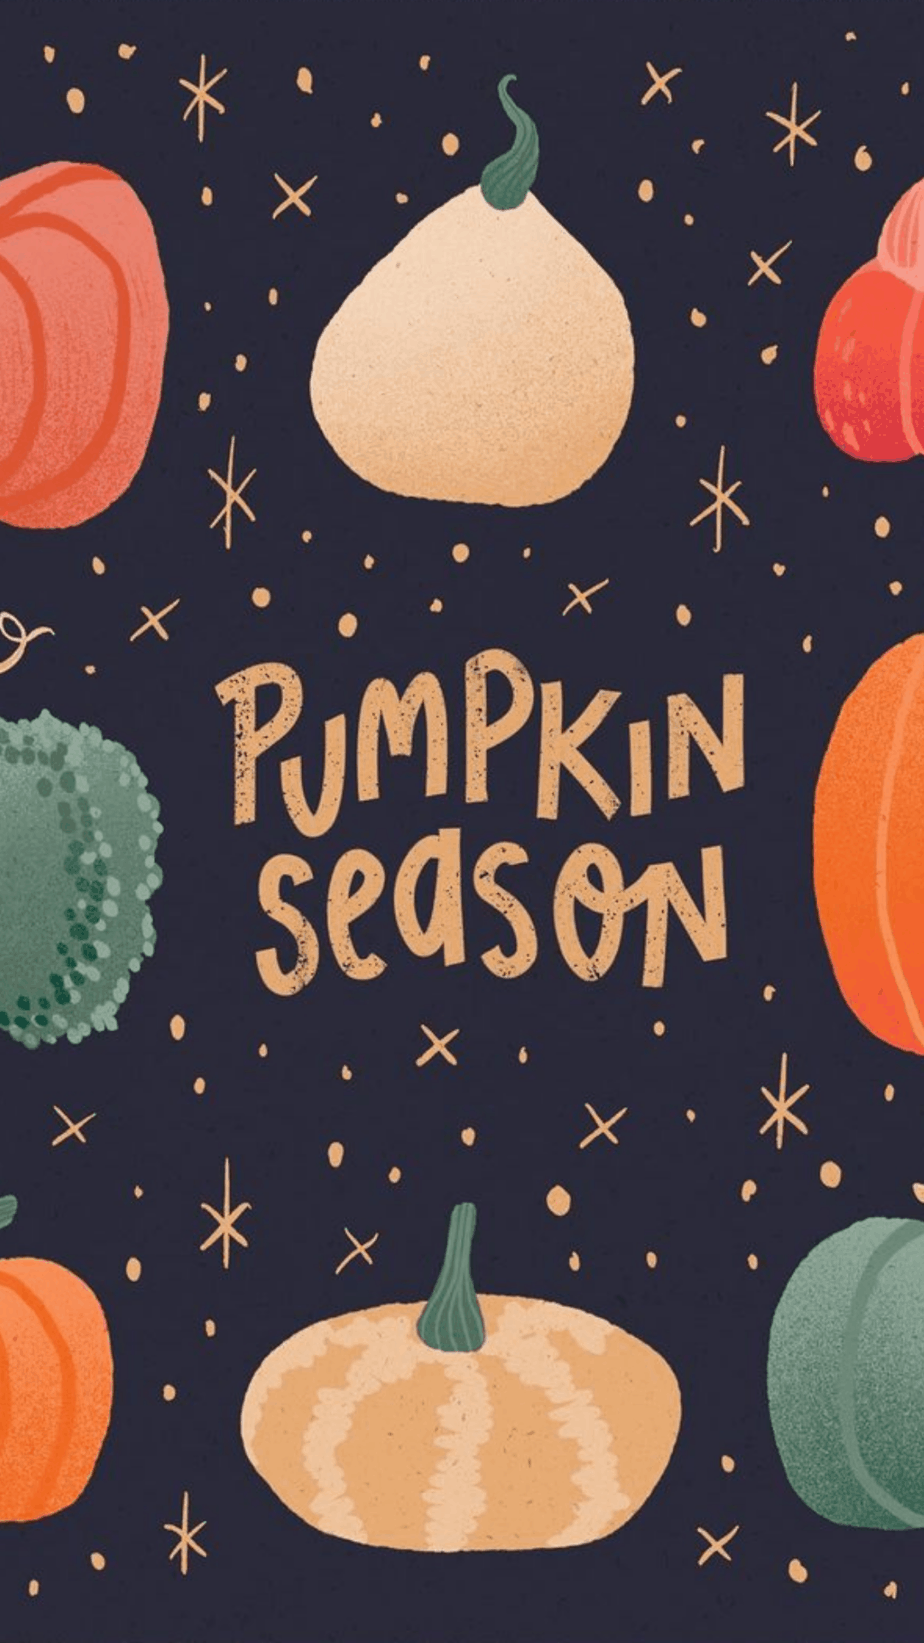 Pumpkin Season Wallpaper